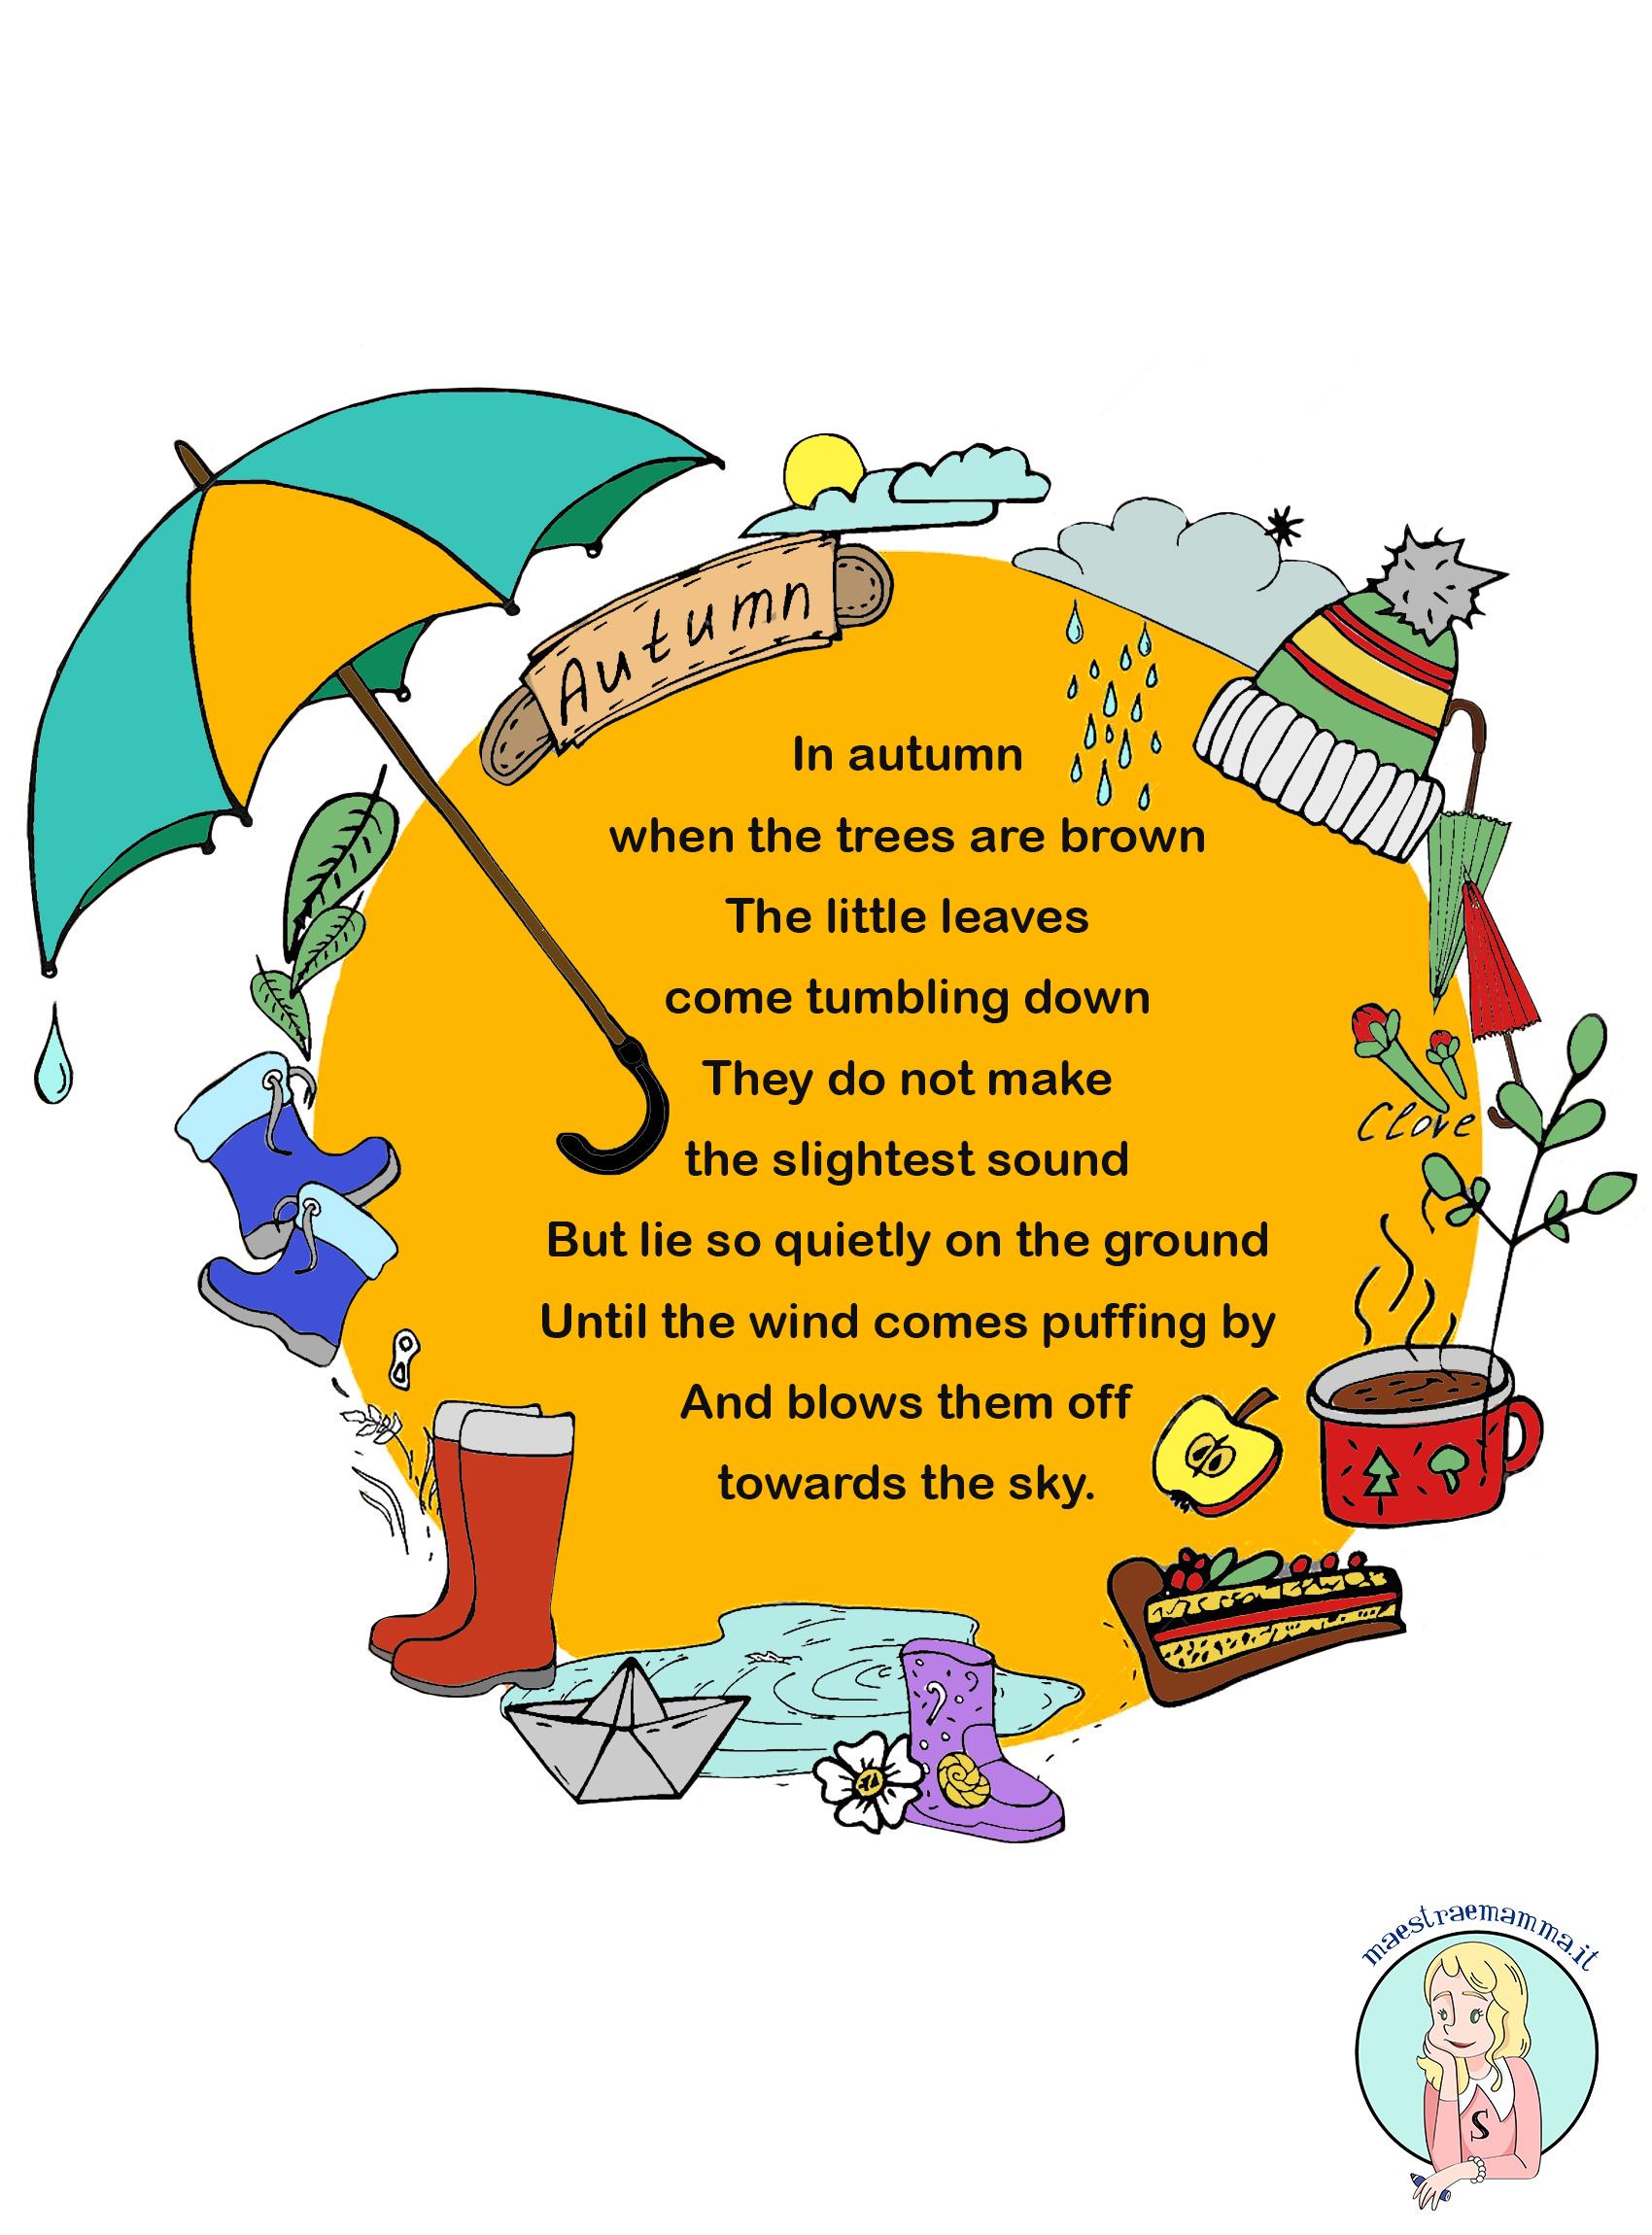 Poesie Di Natale In Inglese Per Bambini.Autumn Poesia Sull Autunno Per Bambini In Inglese Maestraemamma